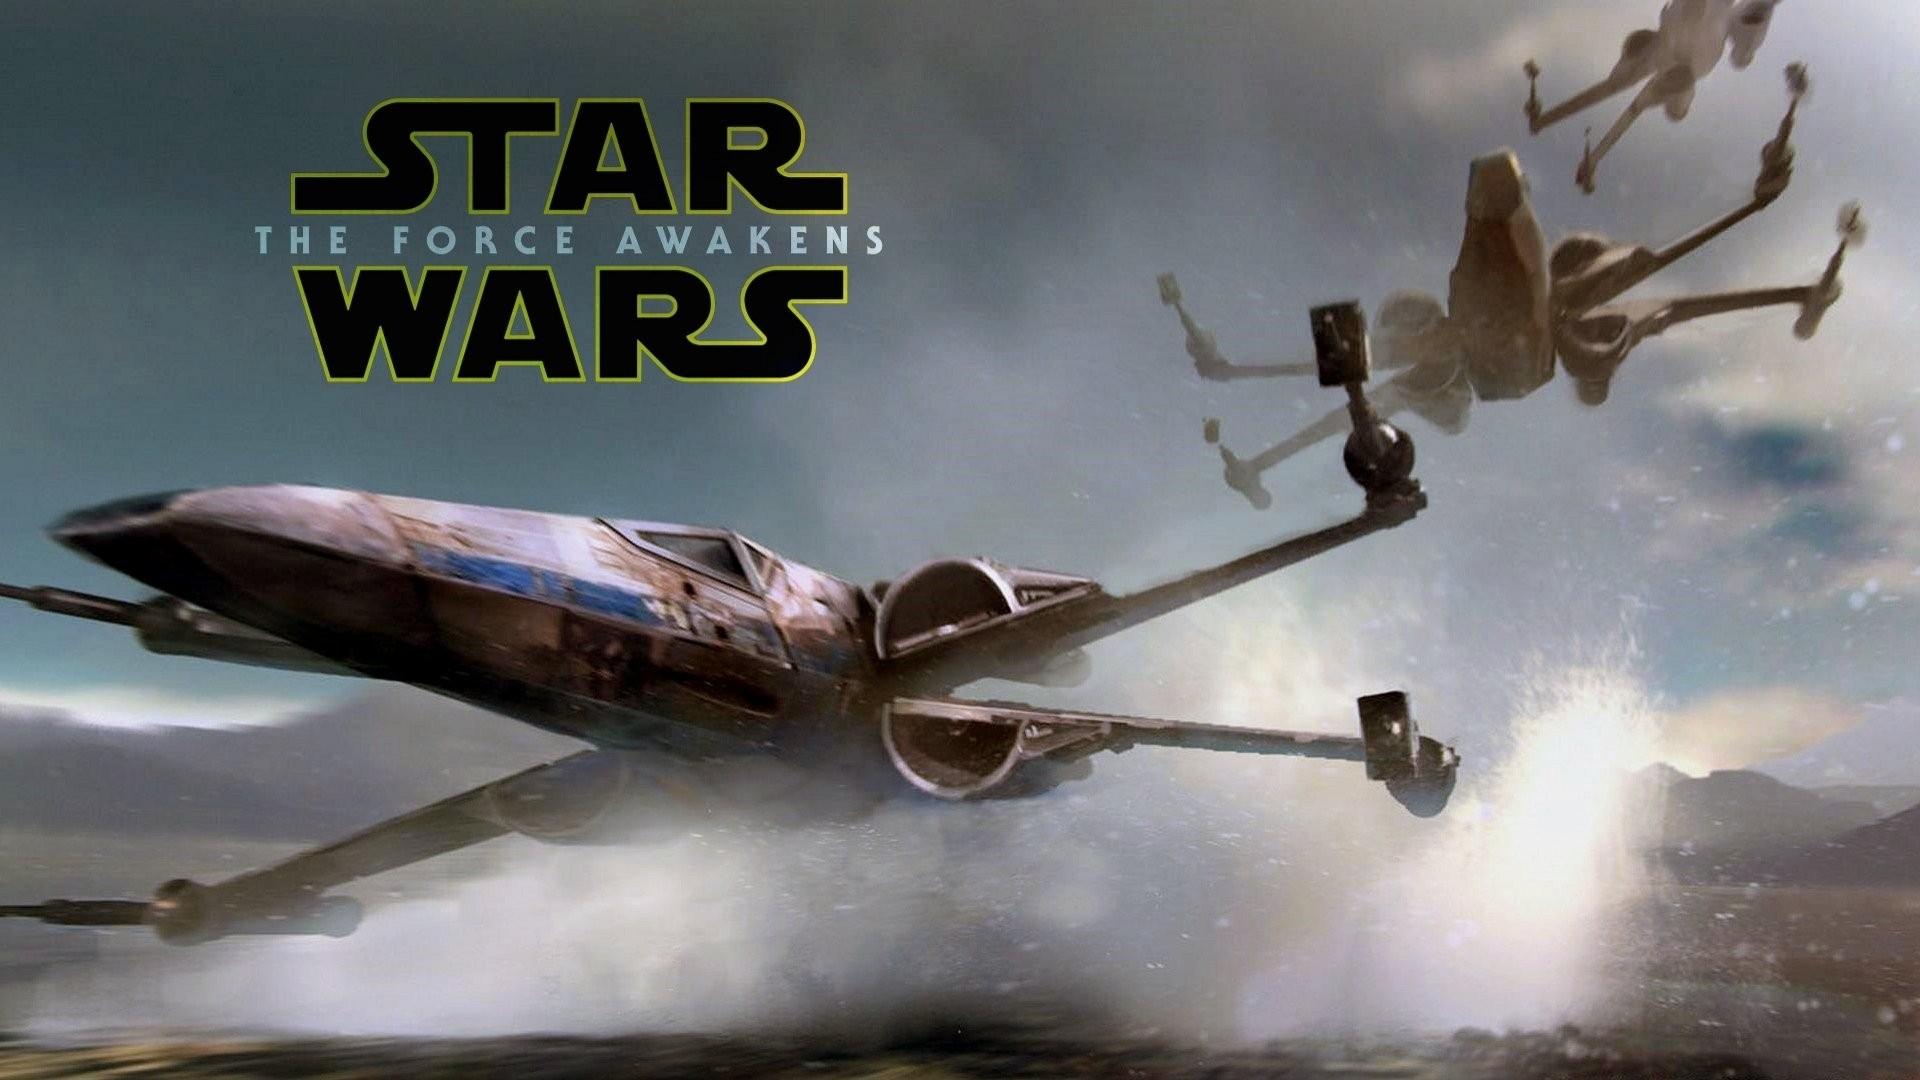 Star Wars The Force Awakens Wallpaper 1920x1080 Download Free